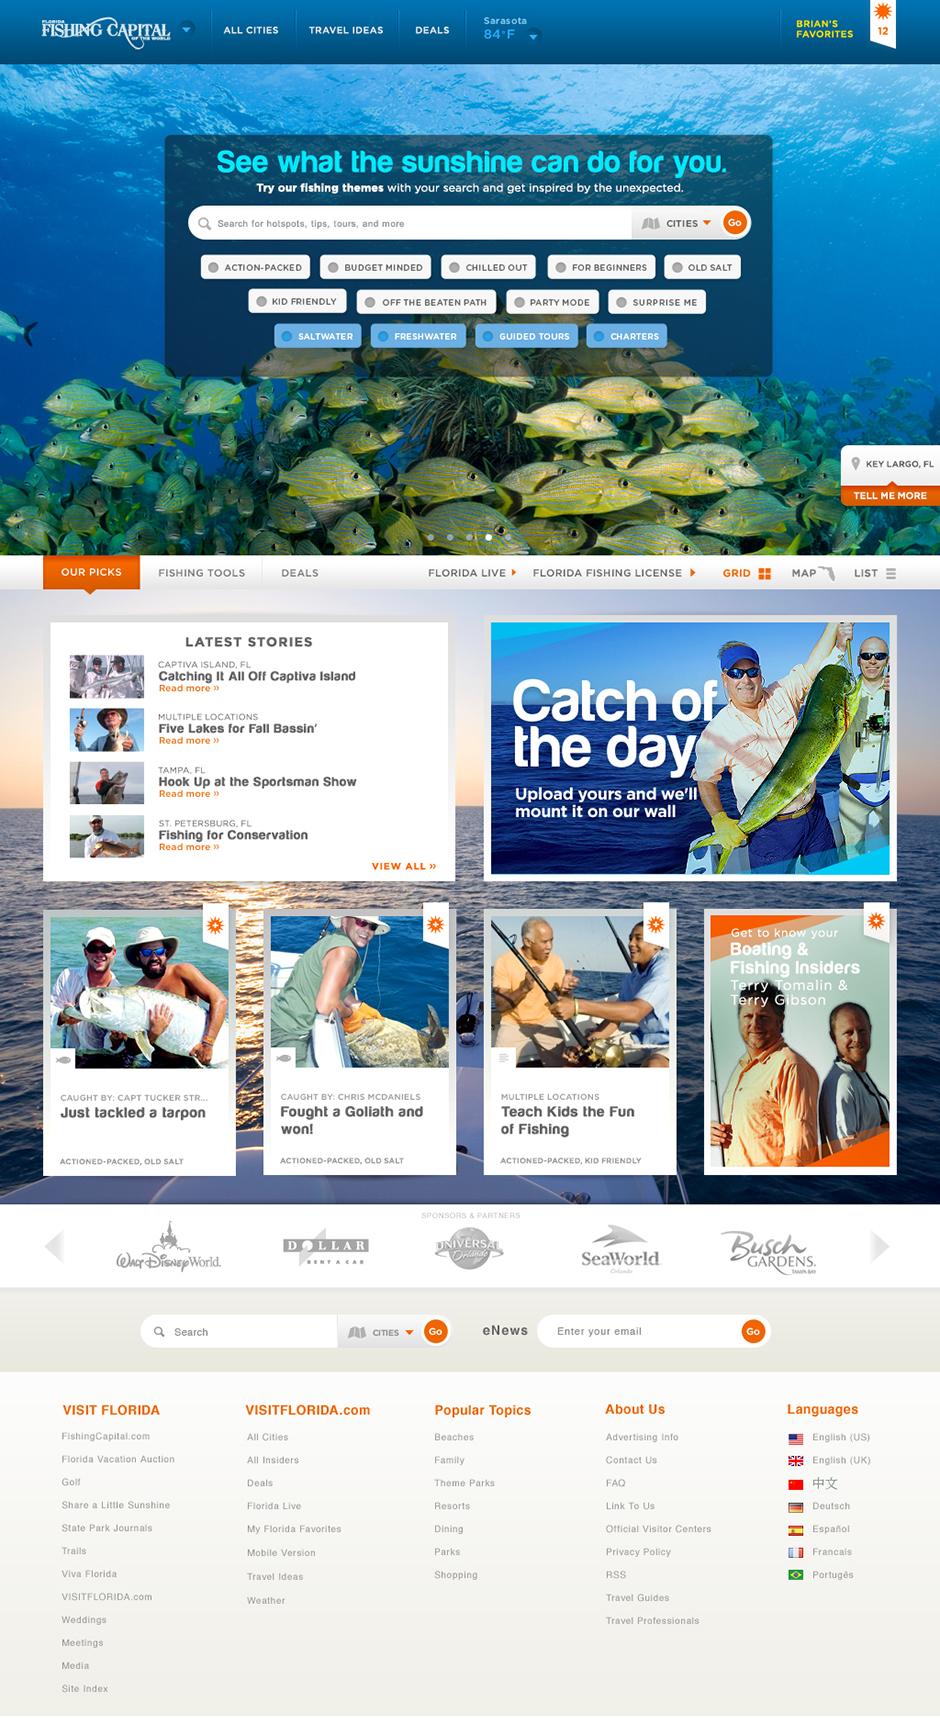 visitflorida.com_fishing